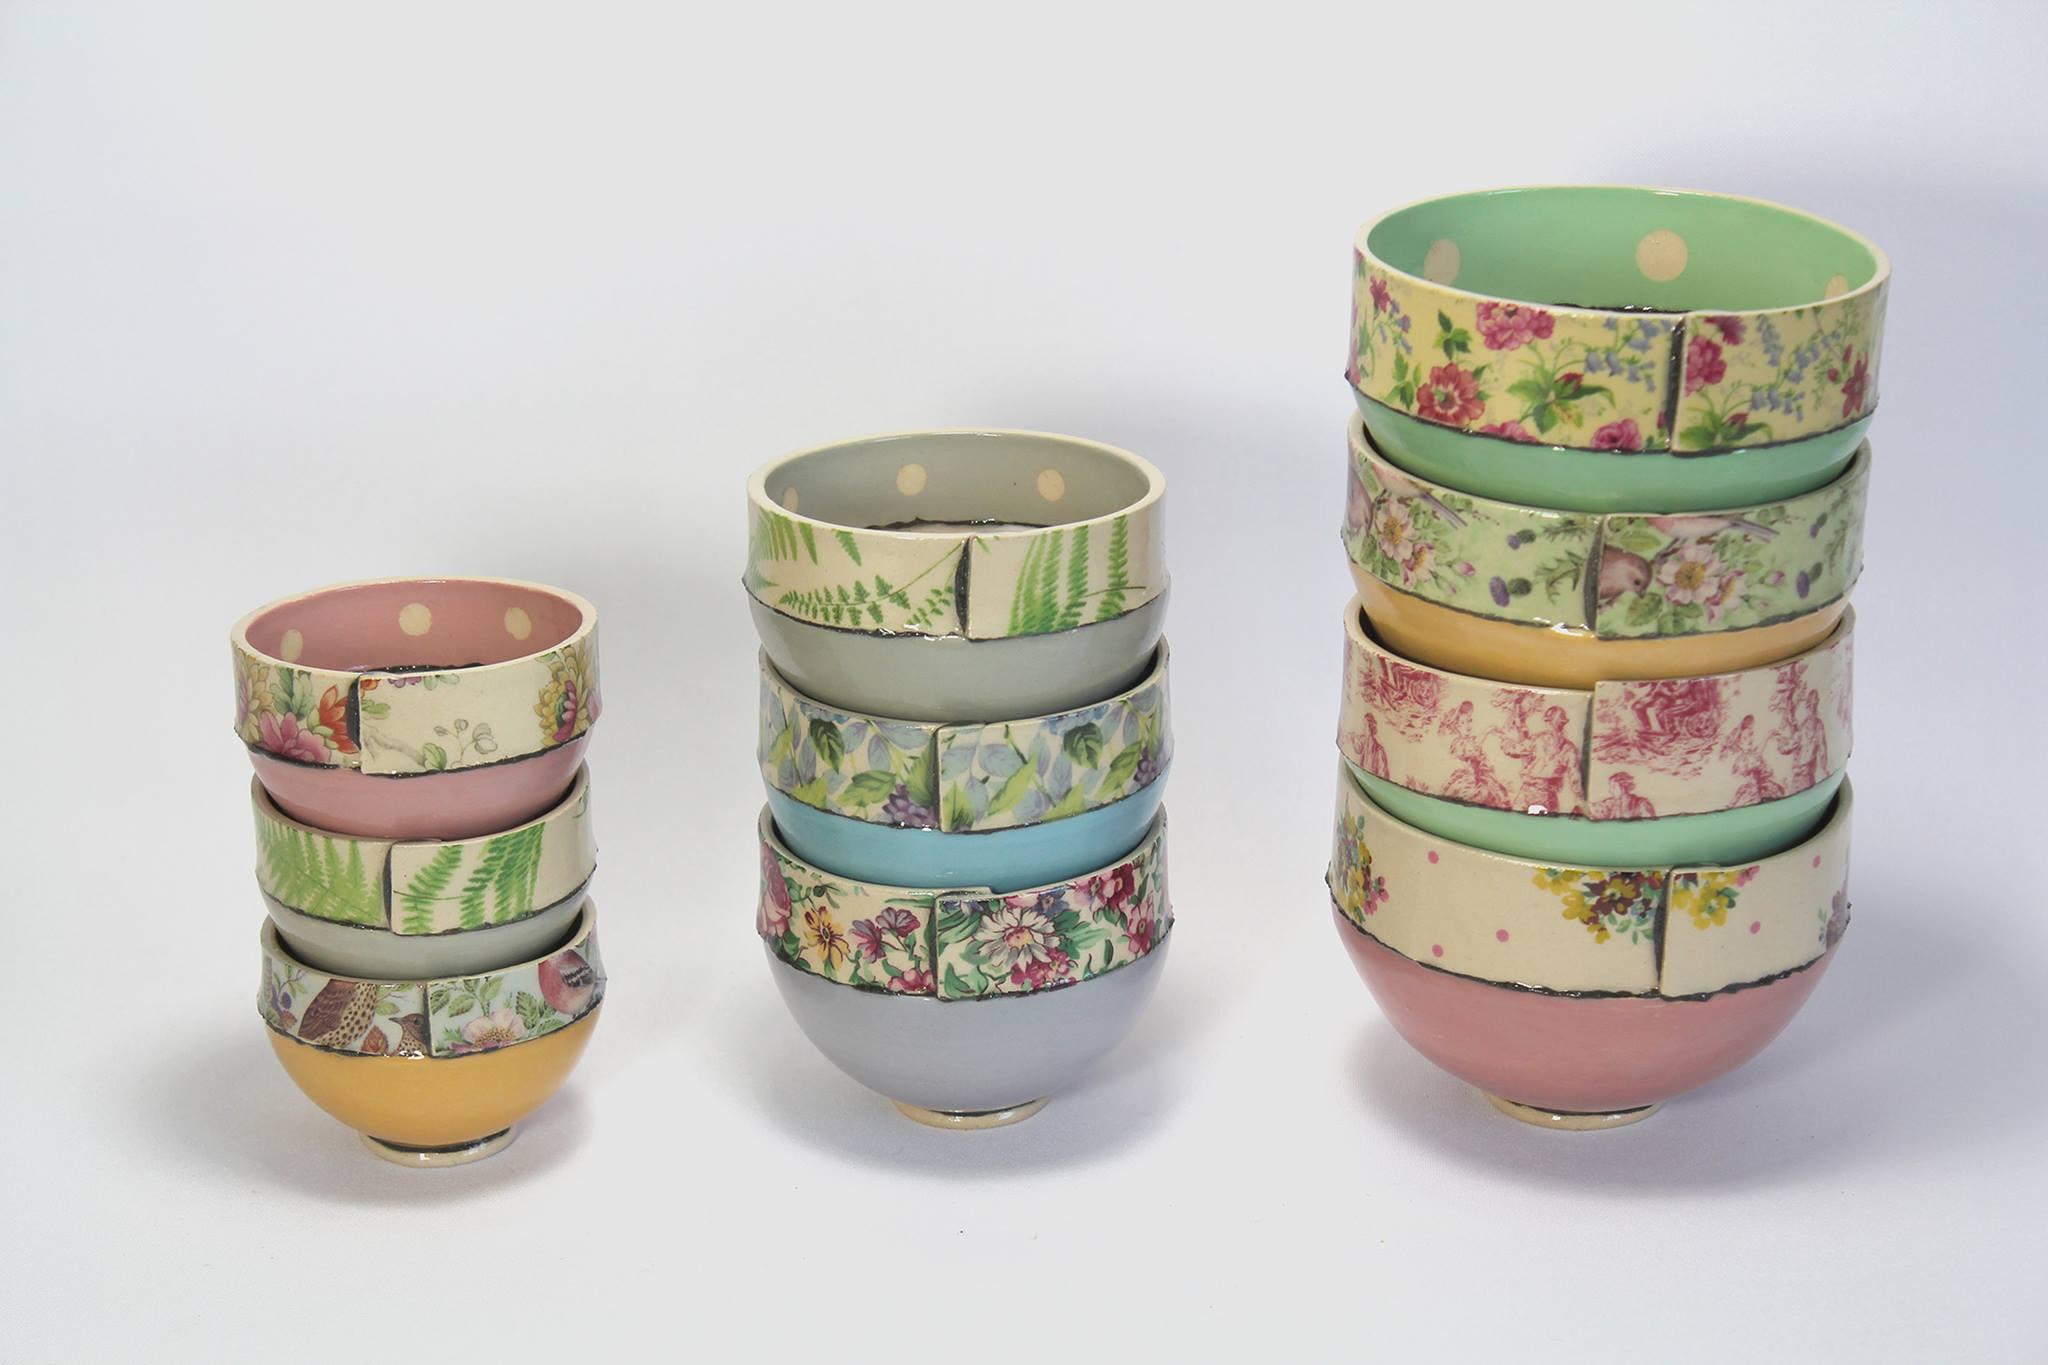 virginia-graham-ceramics-at-penelope-wurr-glass.jpg